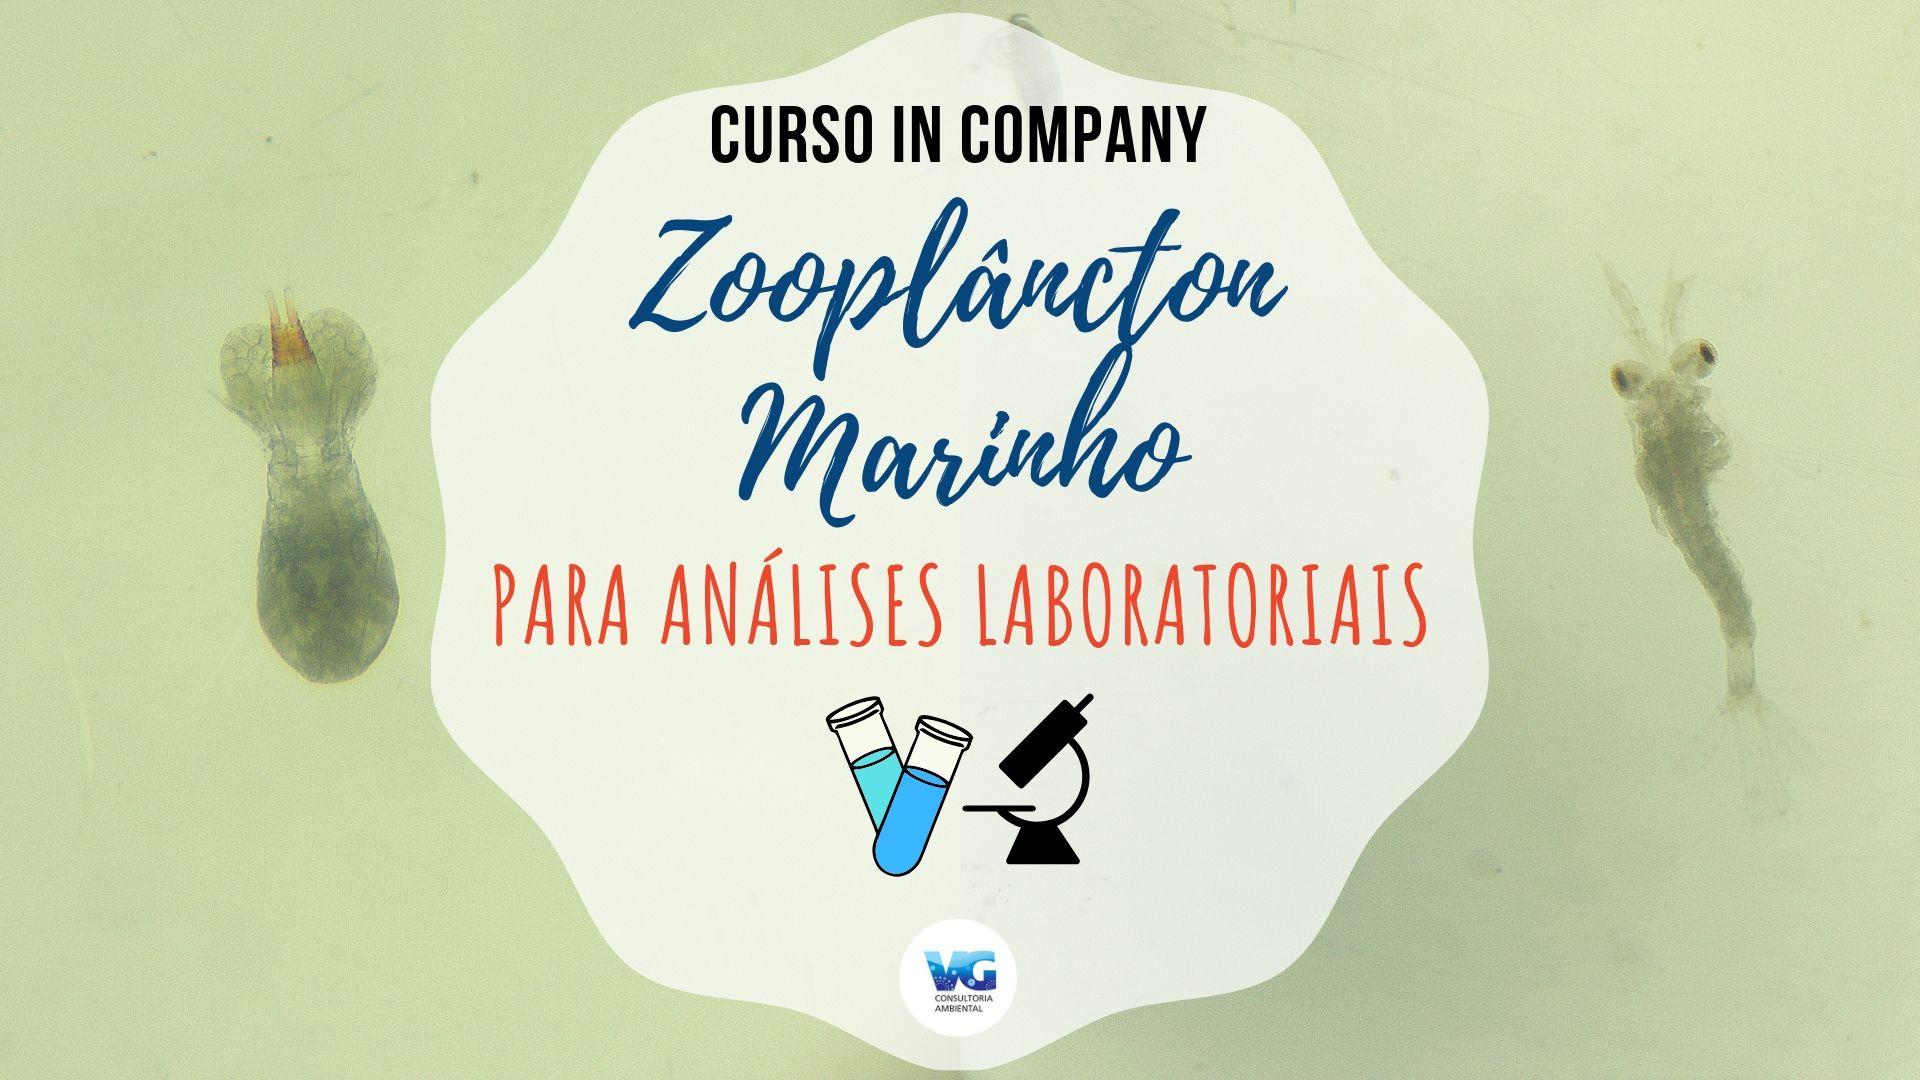 analises-laboratoriais-zoo-marinho-incompany